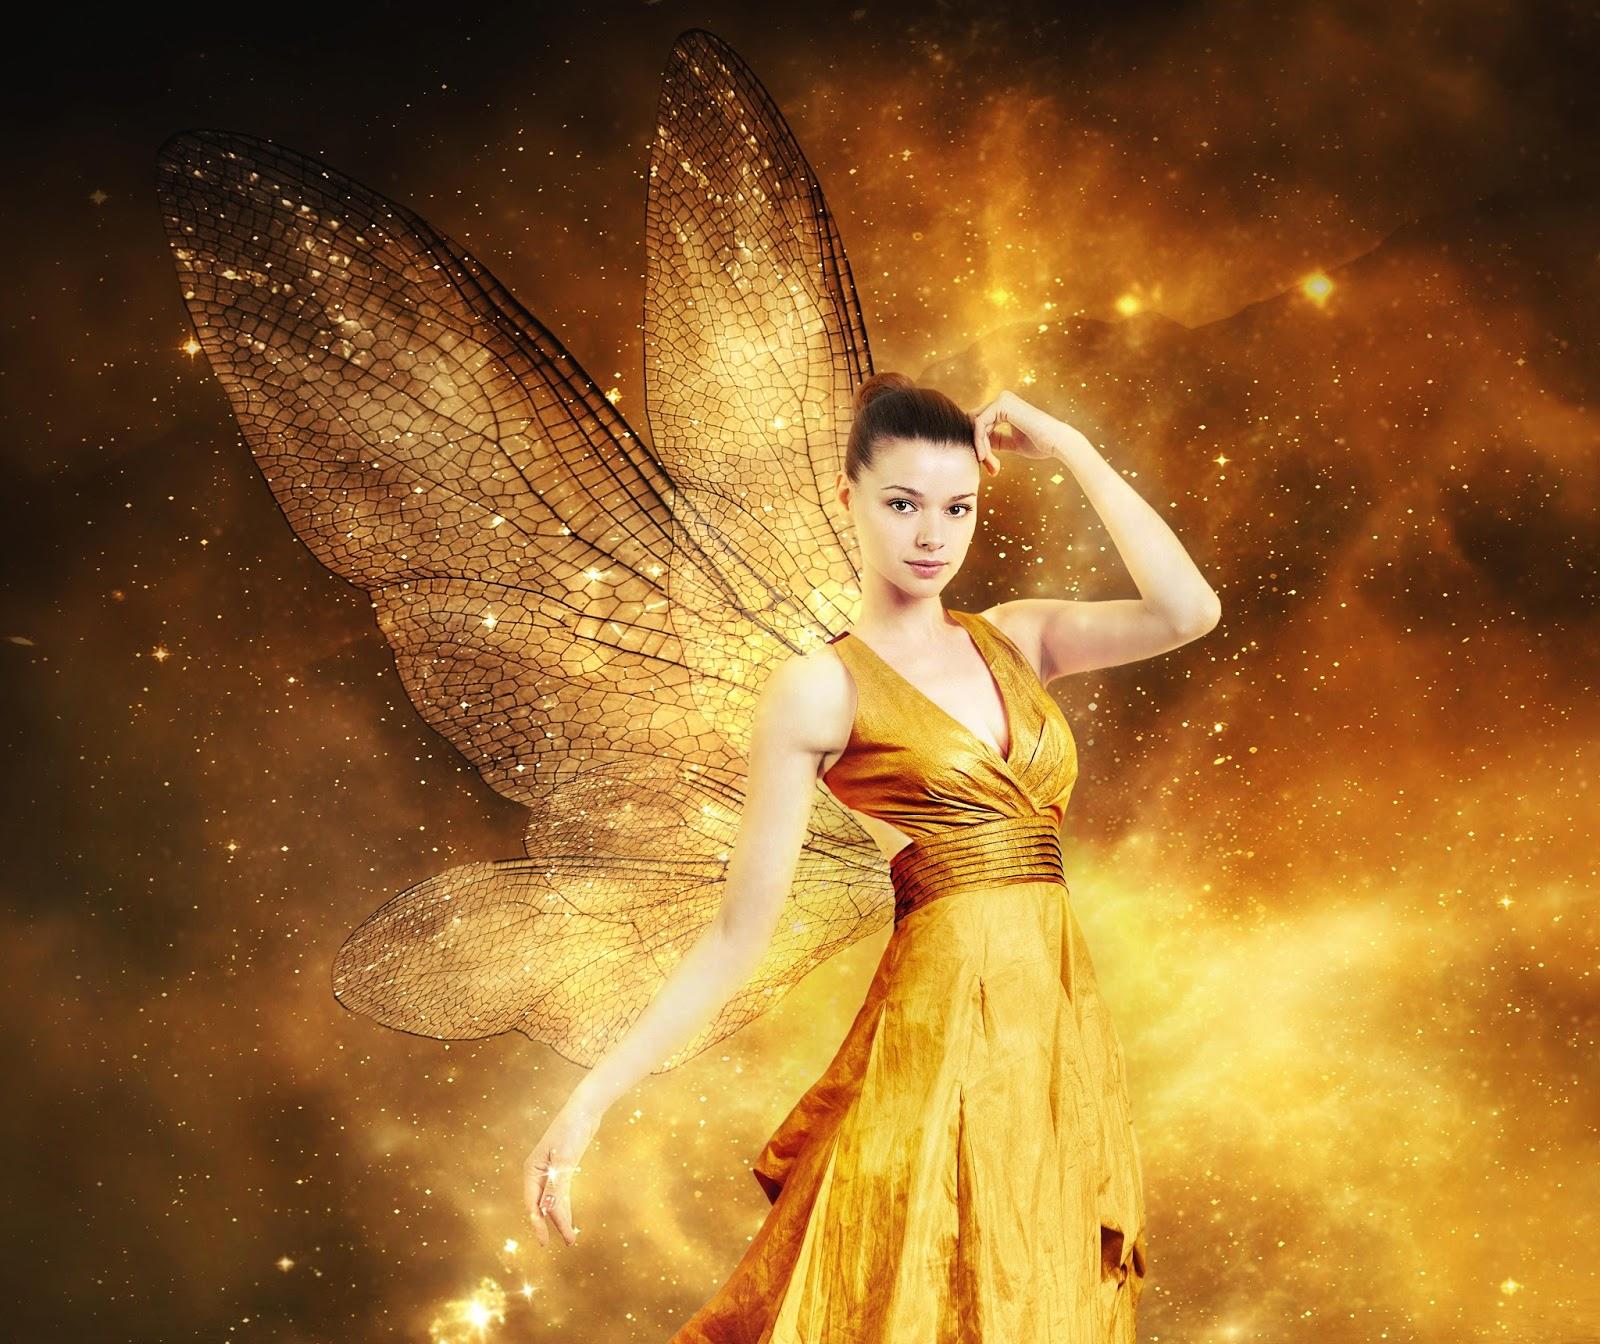 Beautiful Fairy Angel Wallpaper